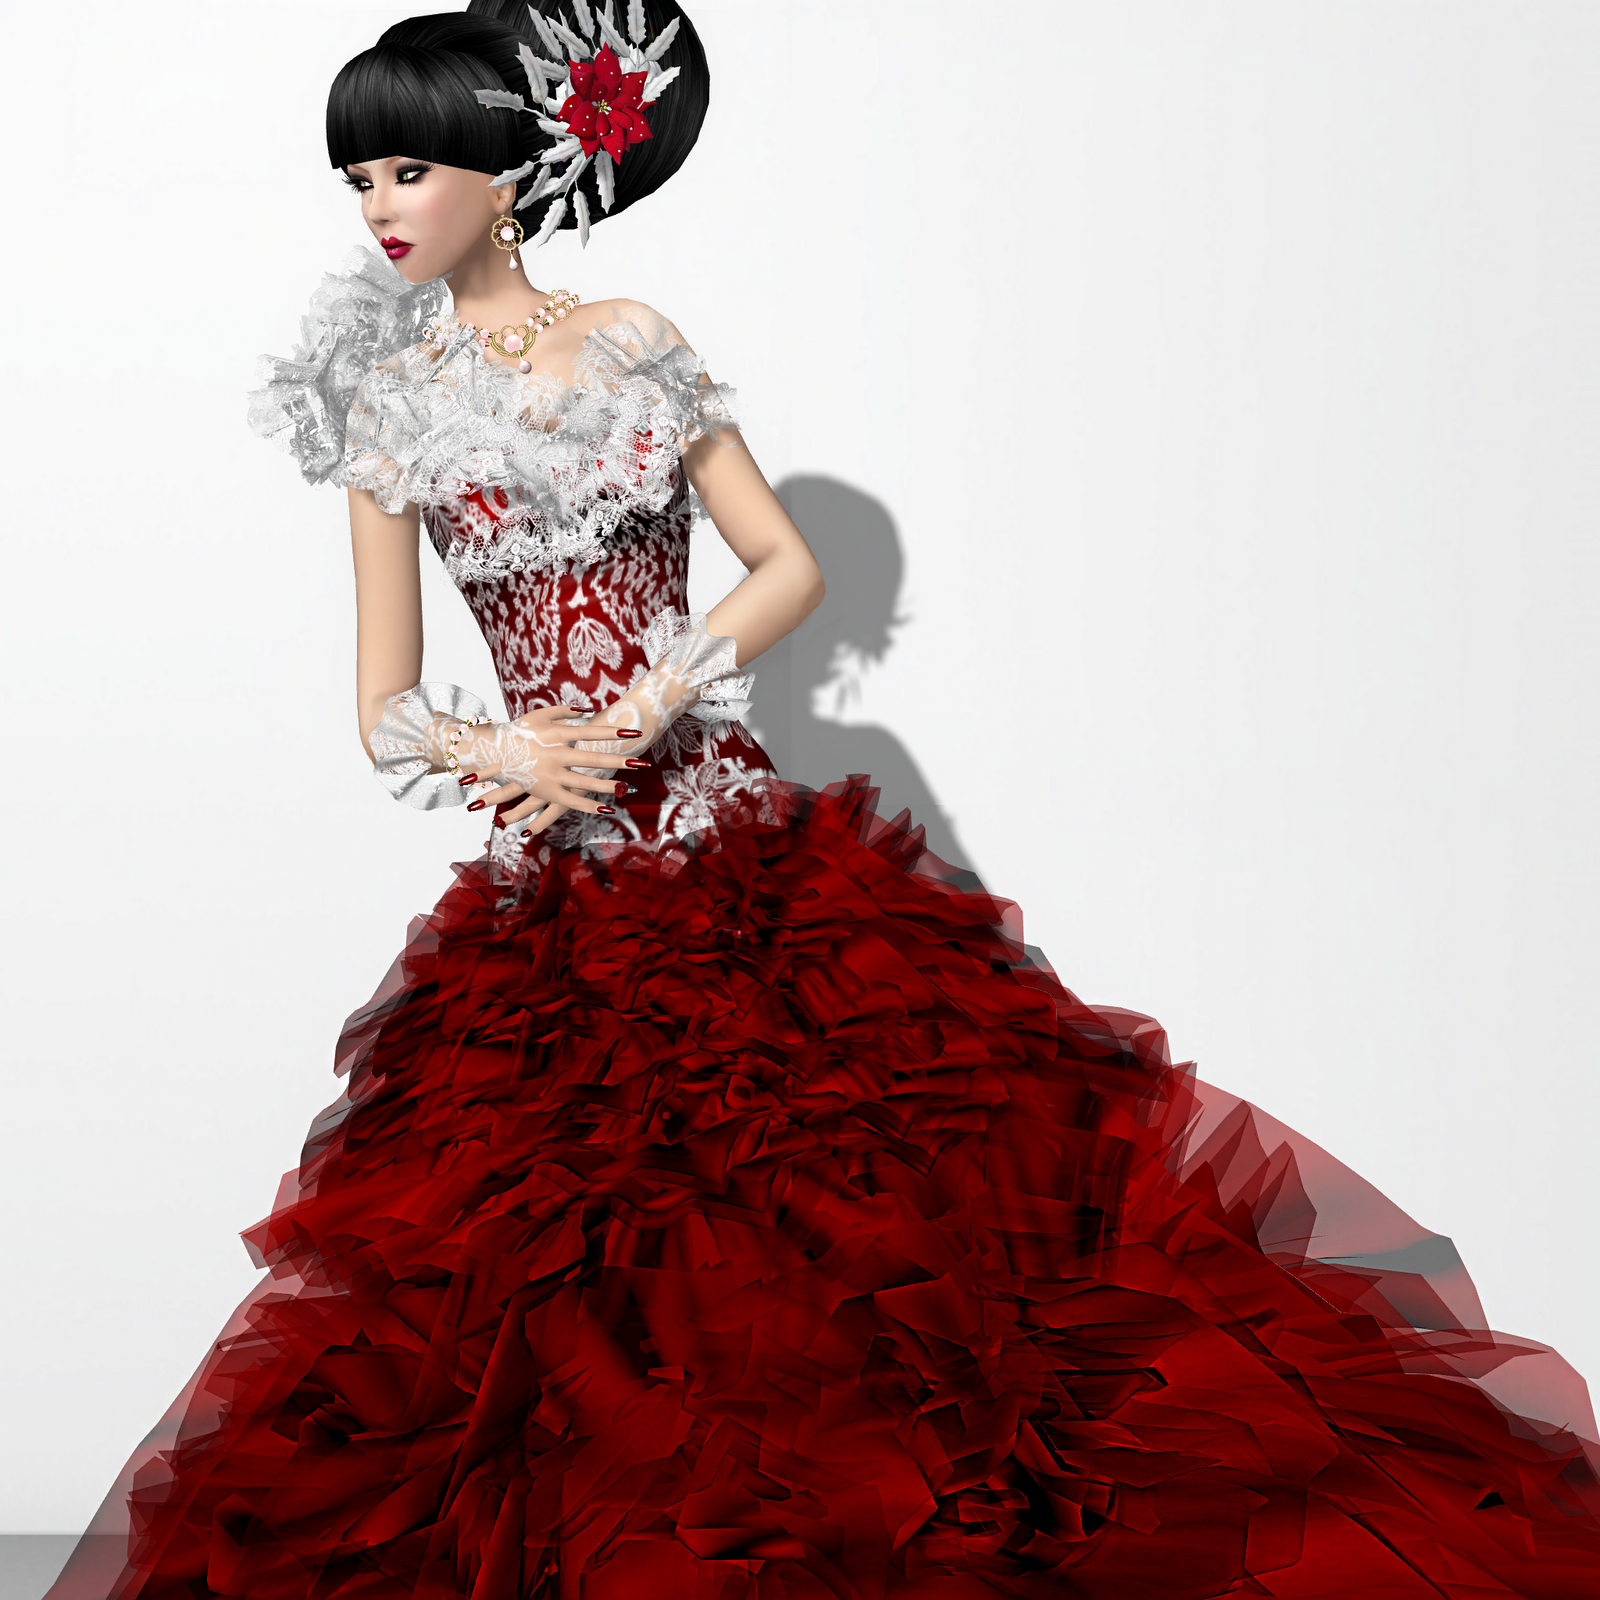 Christmas fashion | Kay Fairey – Fashion Forward